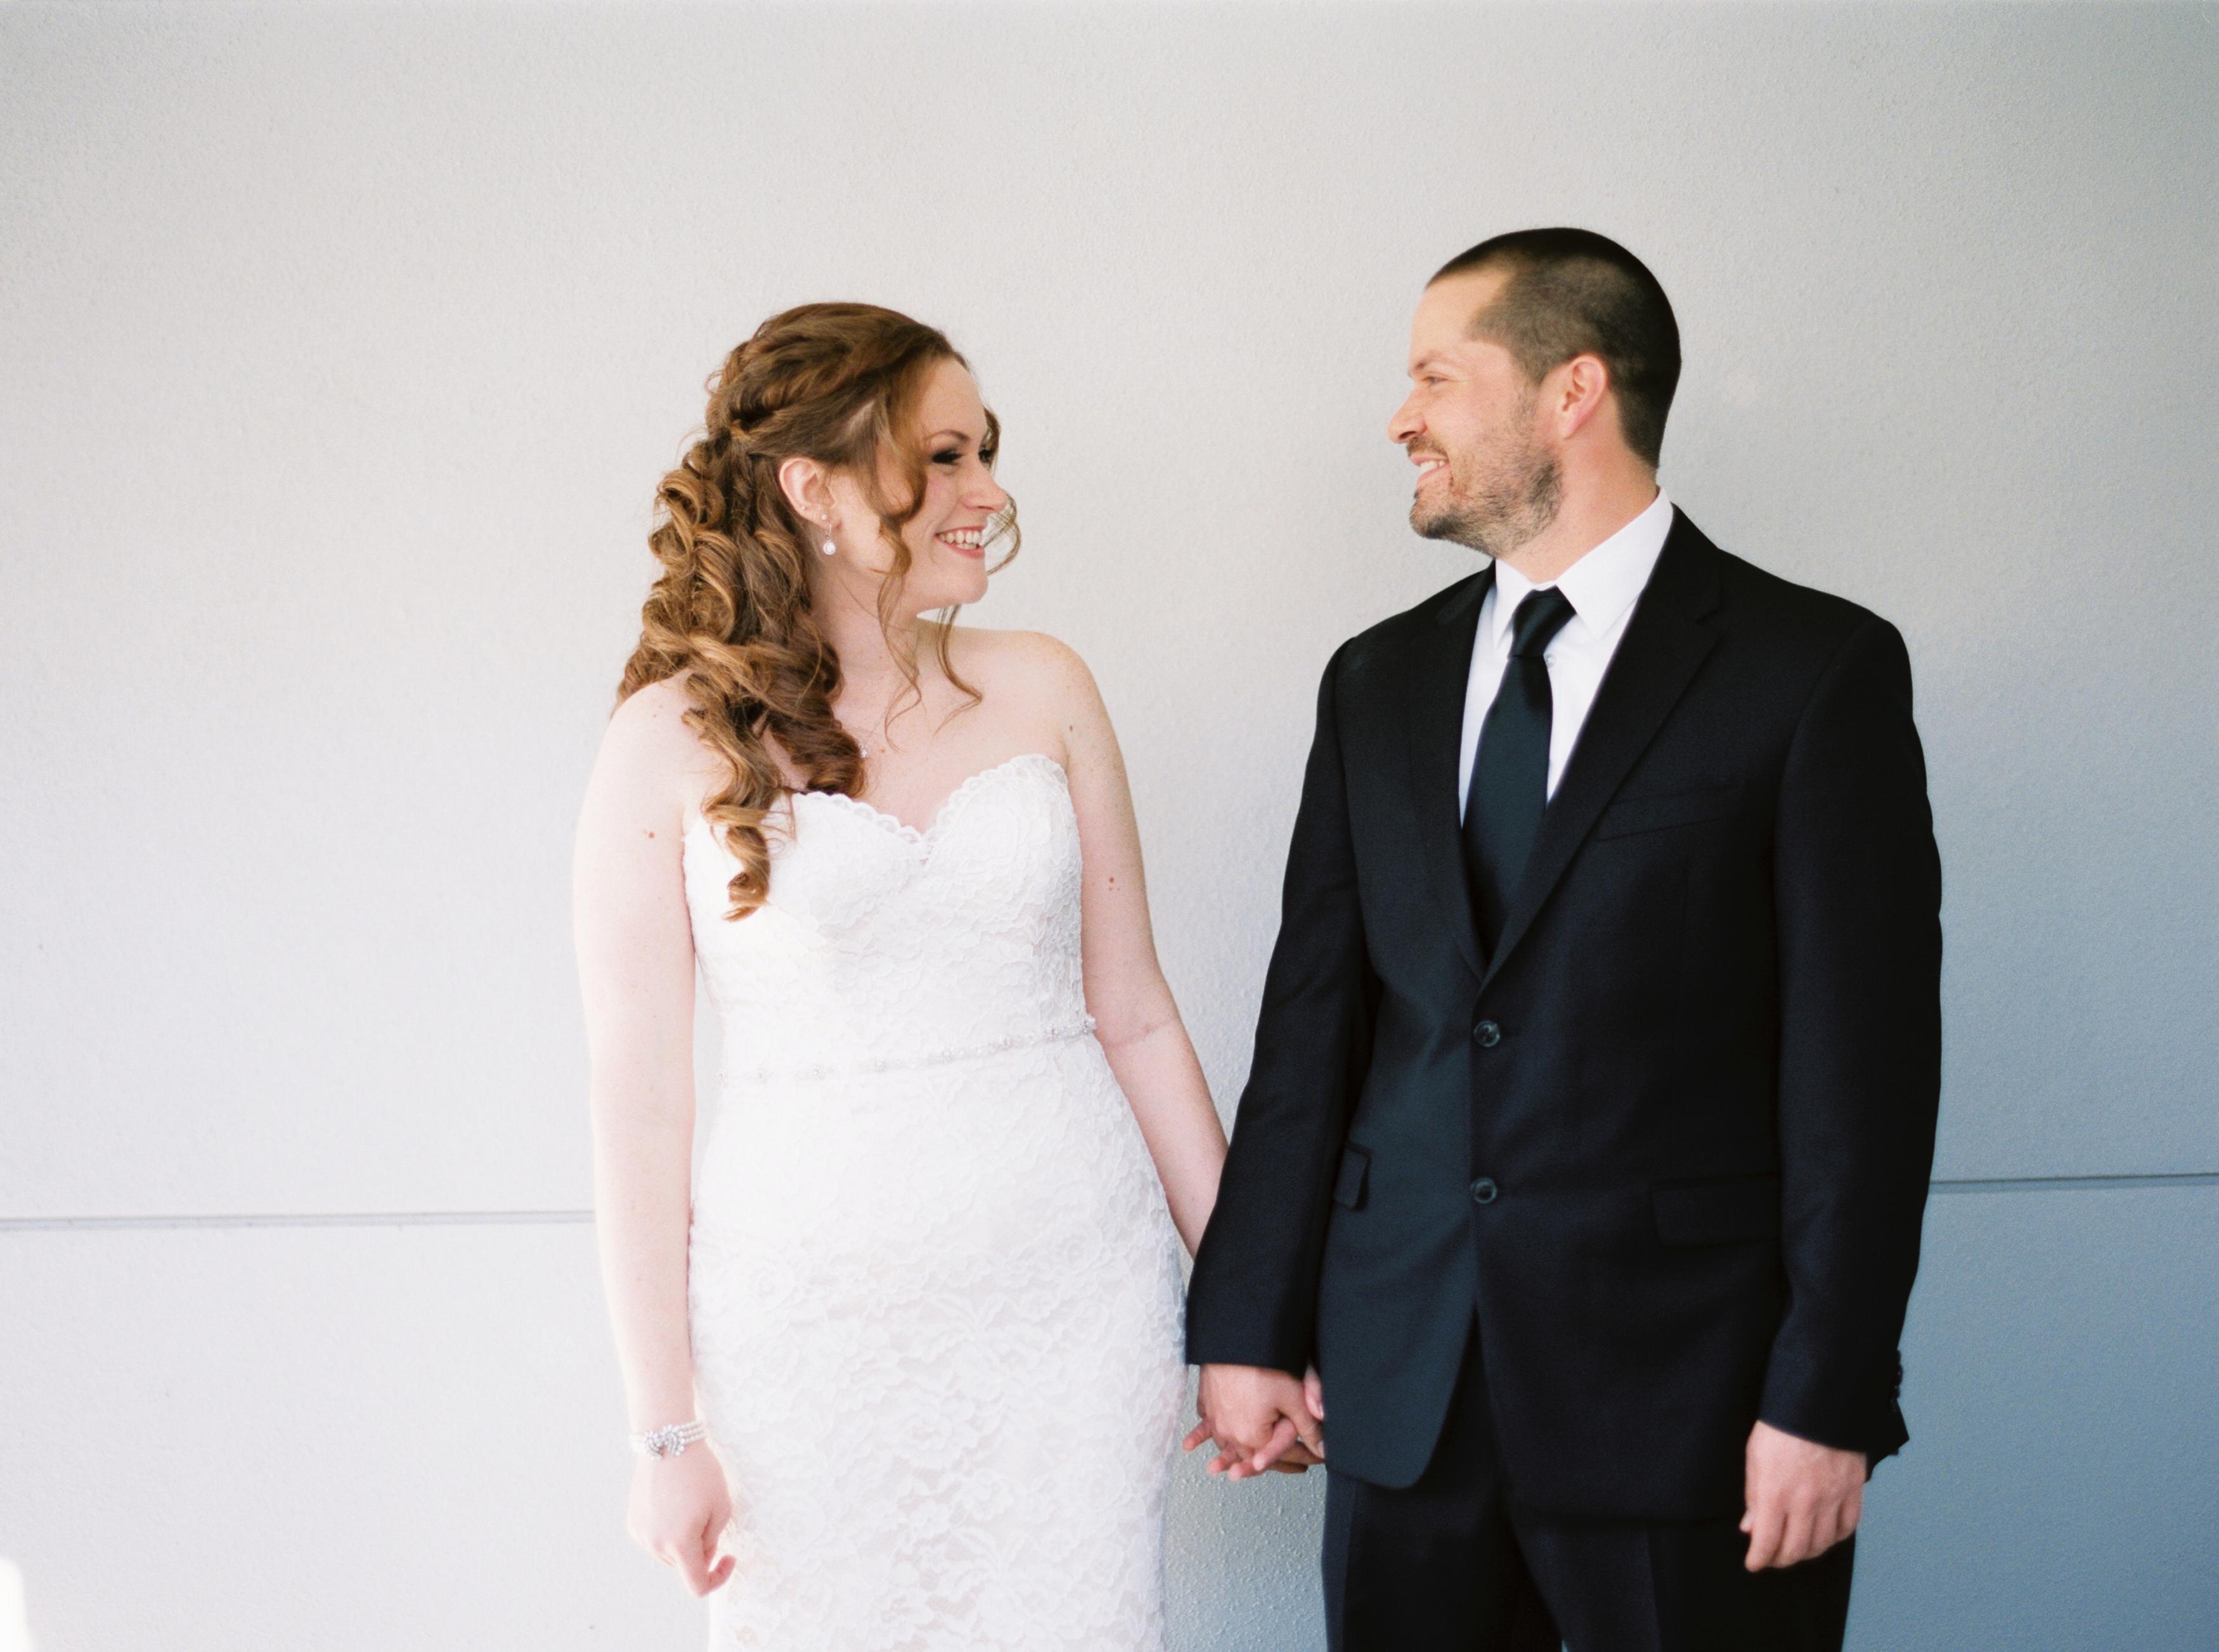 Sarasota Photographer Bride and Groom Portraits